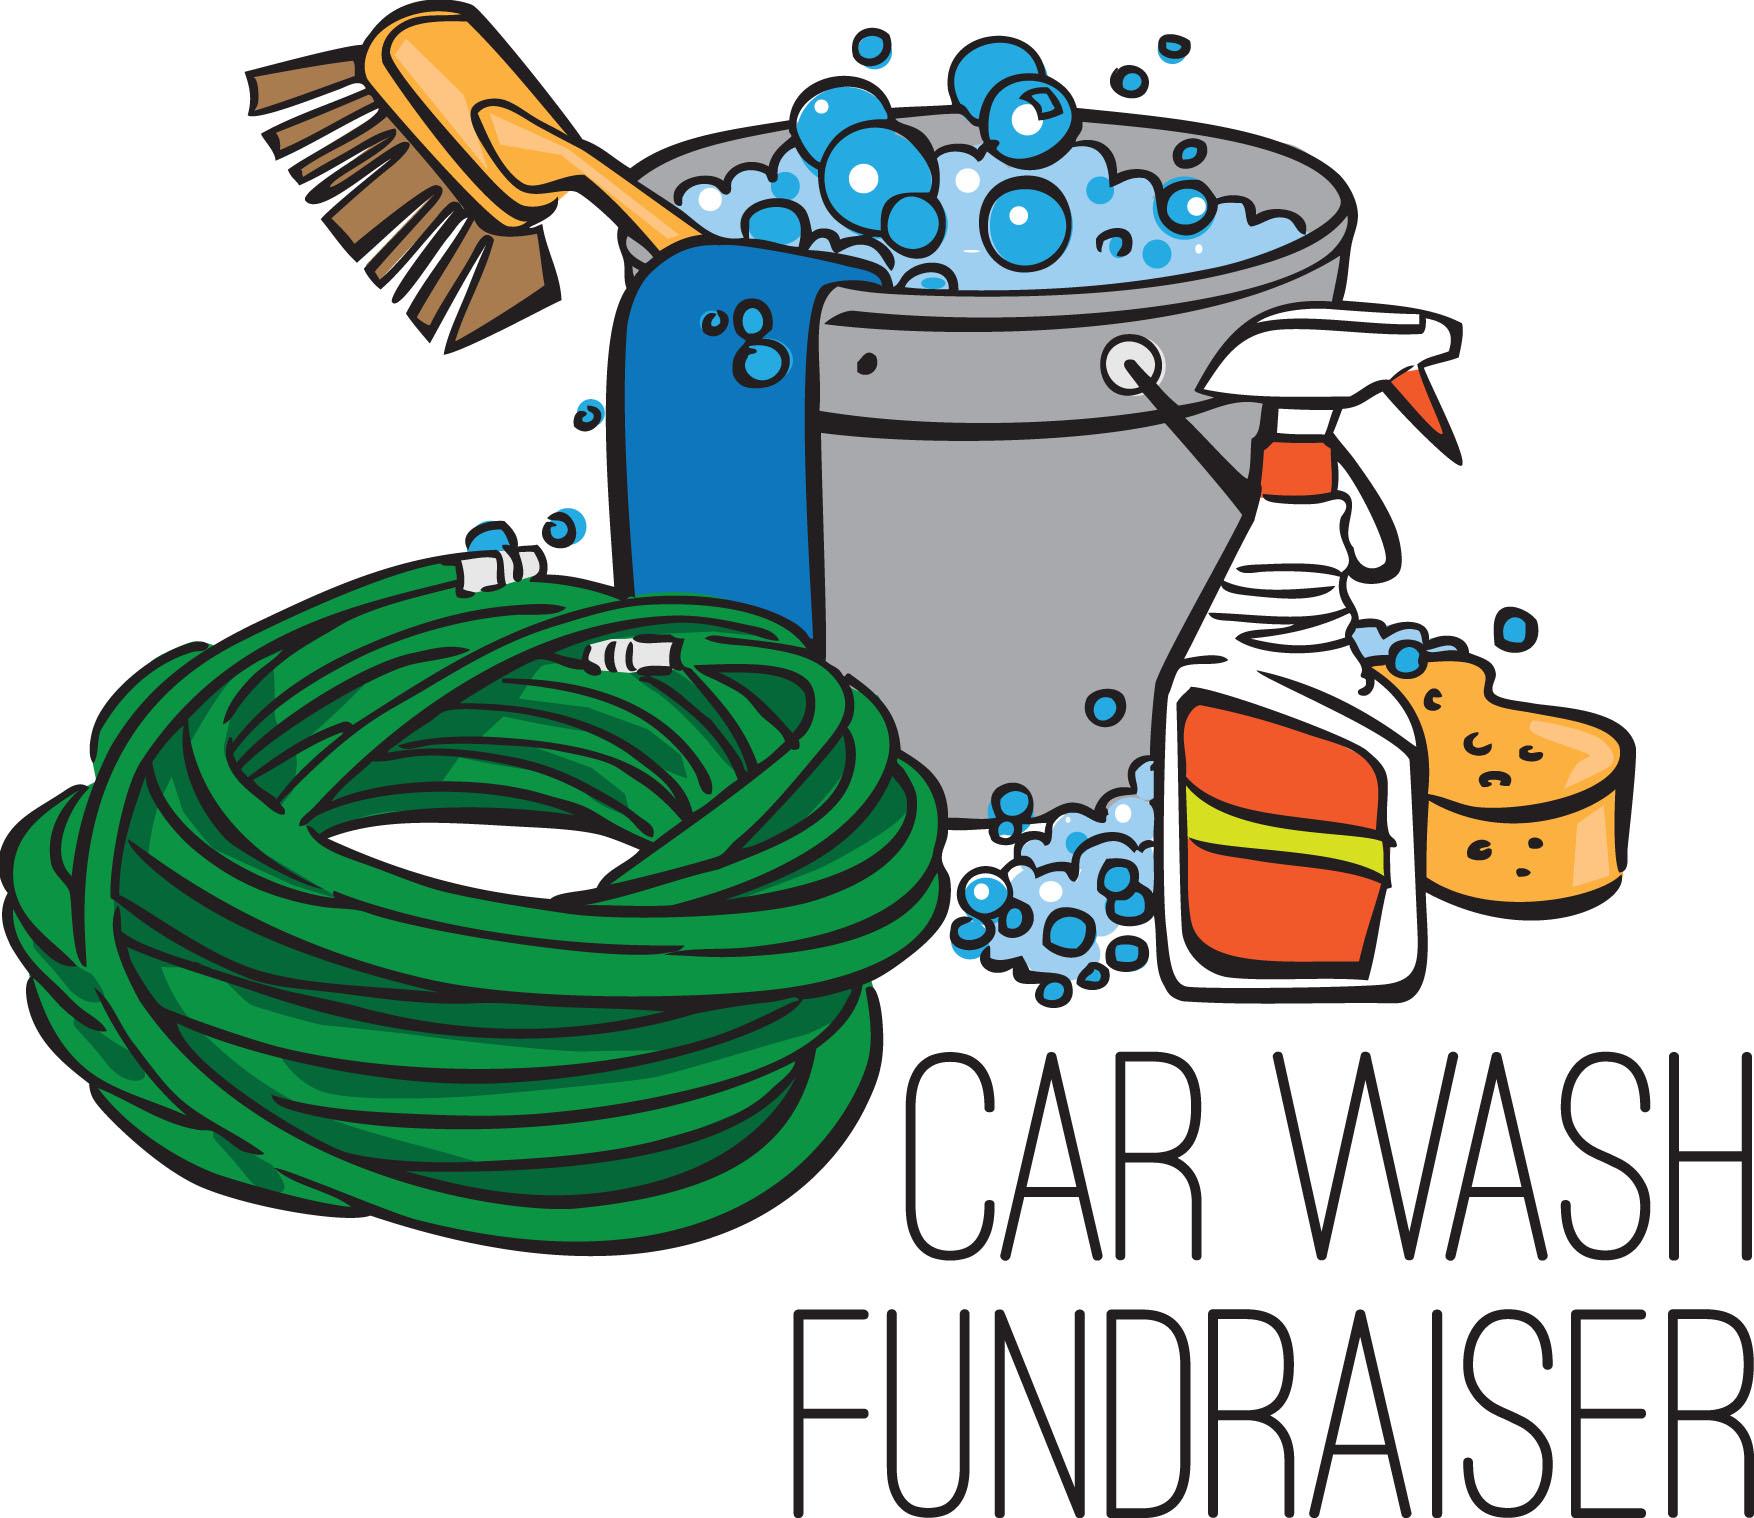 Car Wash Saturday 23rd April 10am Til 12